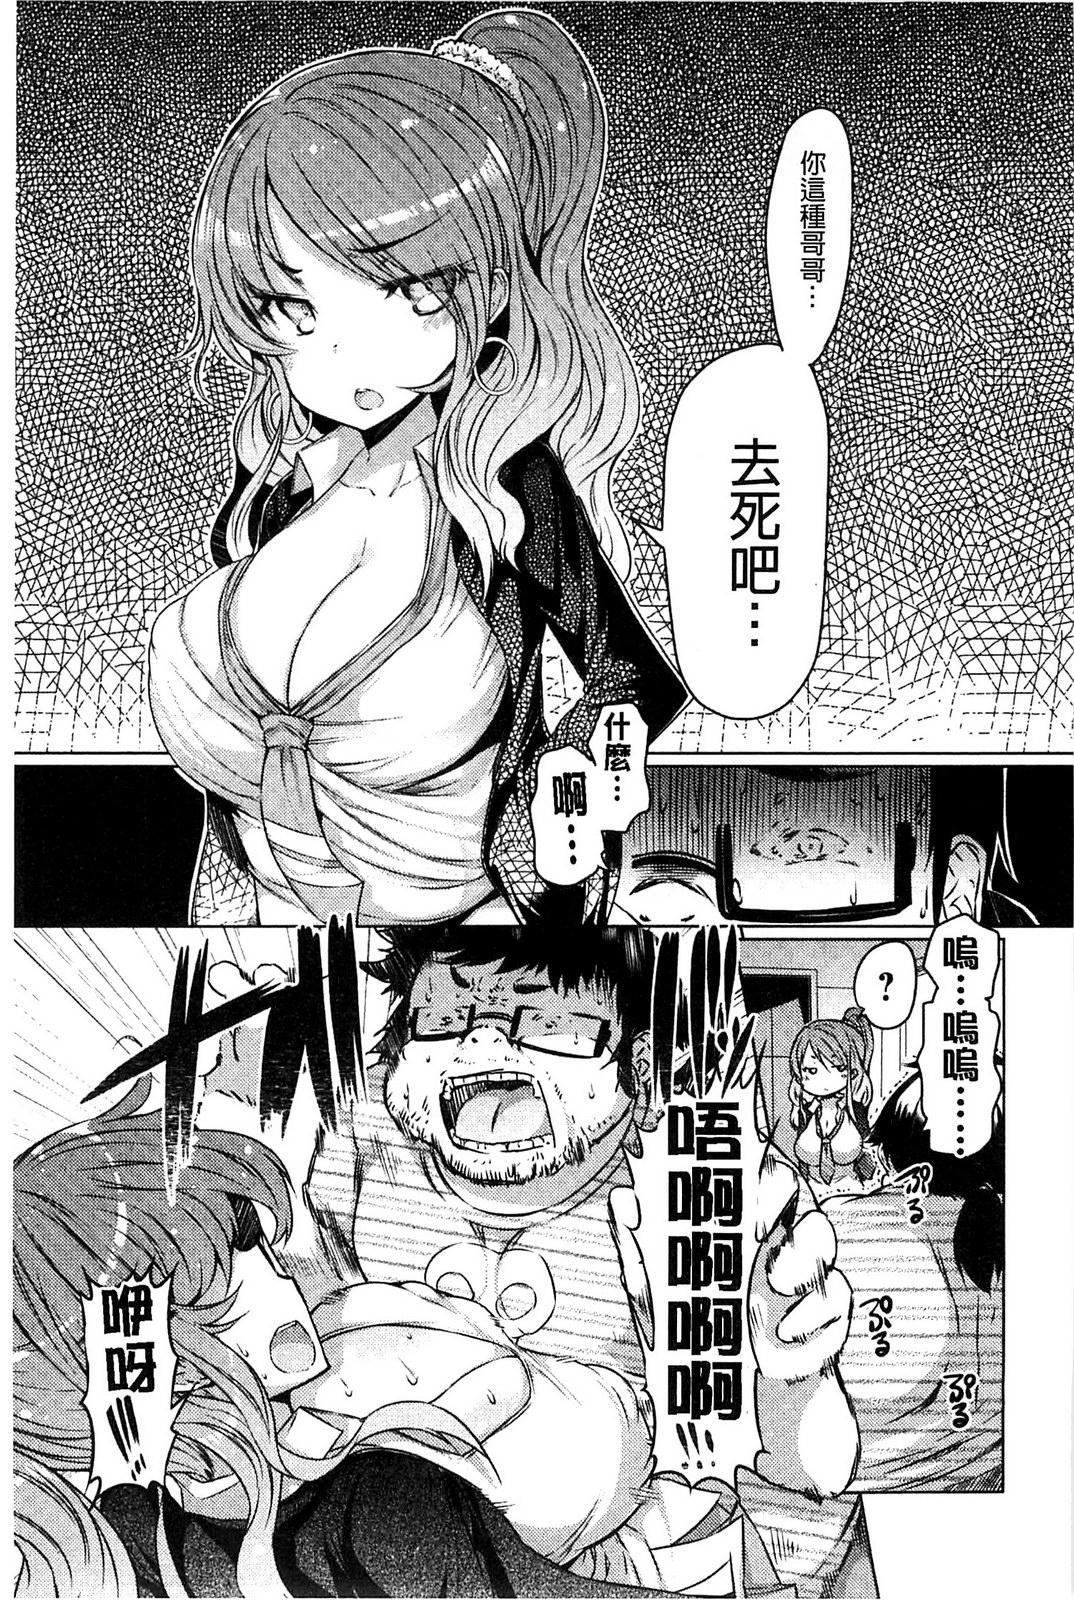 Imouto Kansatsu Nikki - The Record of Sex with My Sister 95